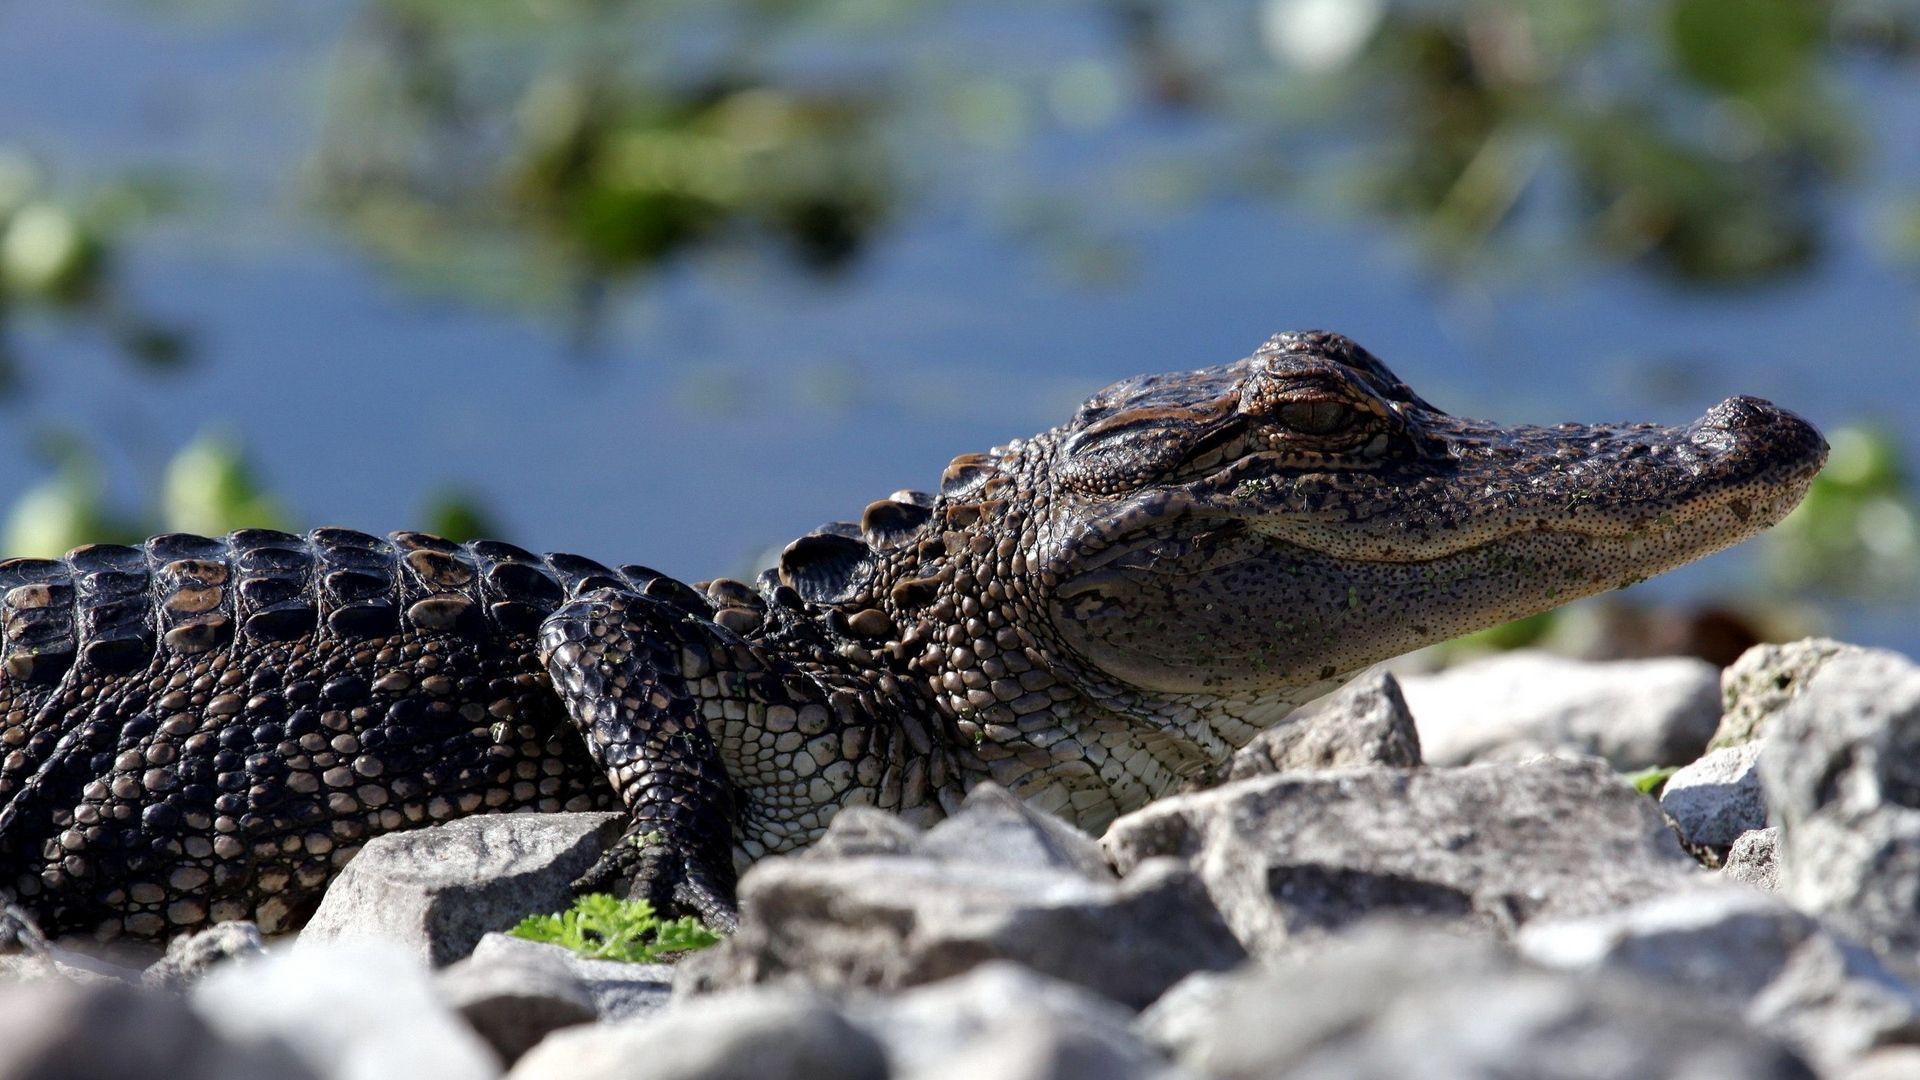 Reptiles Crocodiles